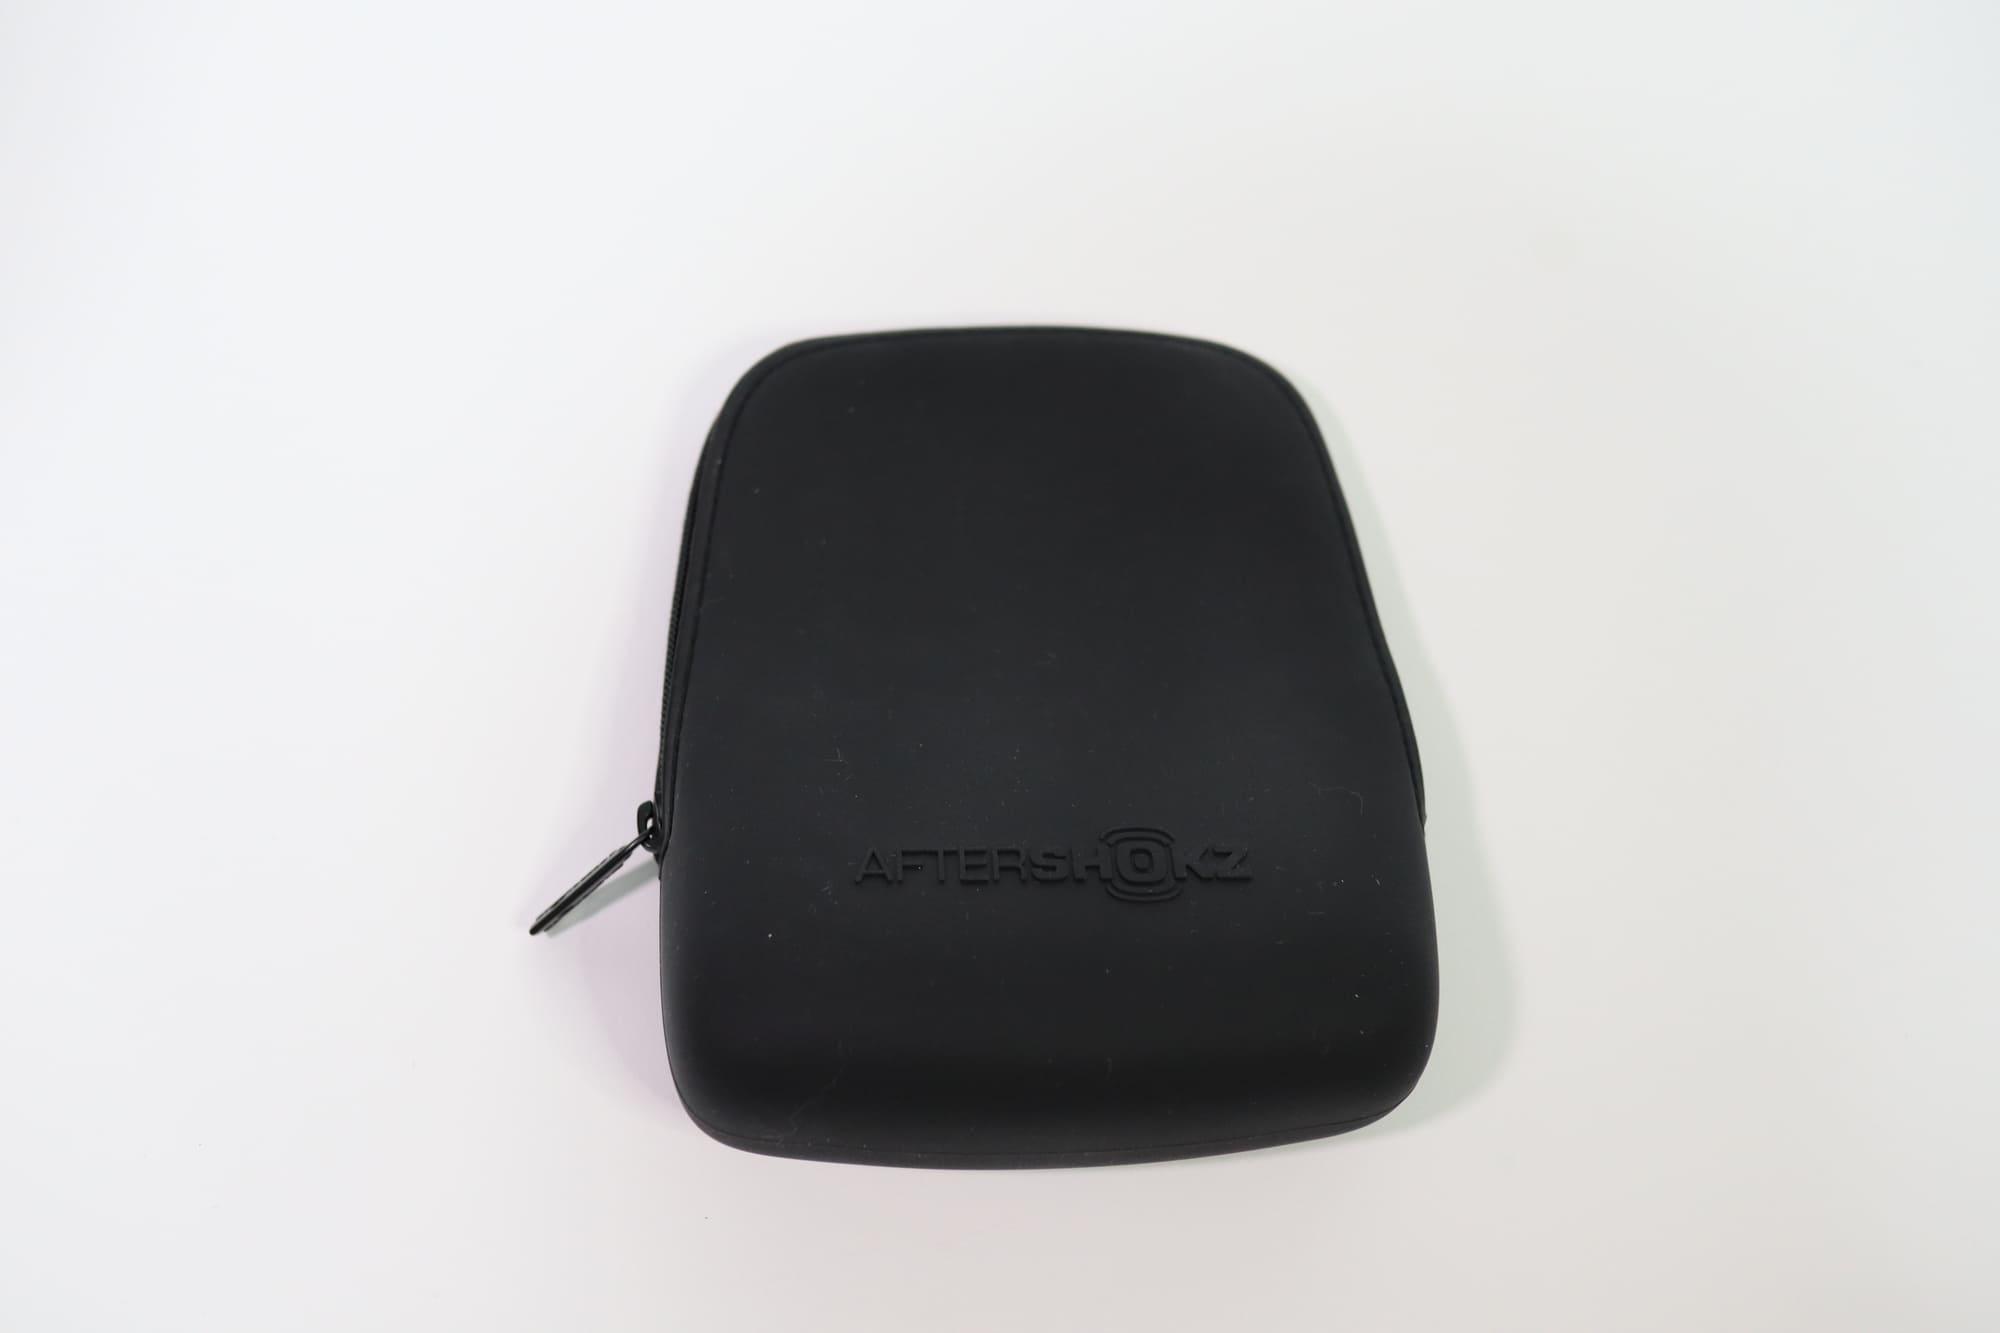 AfterShokz Xtrainerz付属のシリコンケース